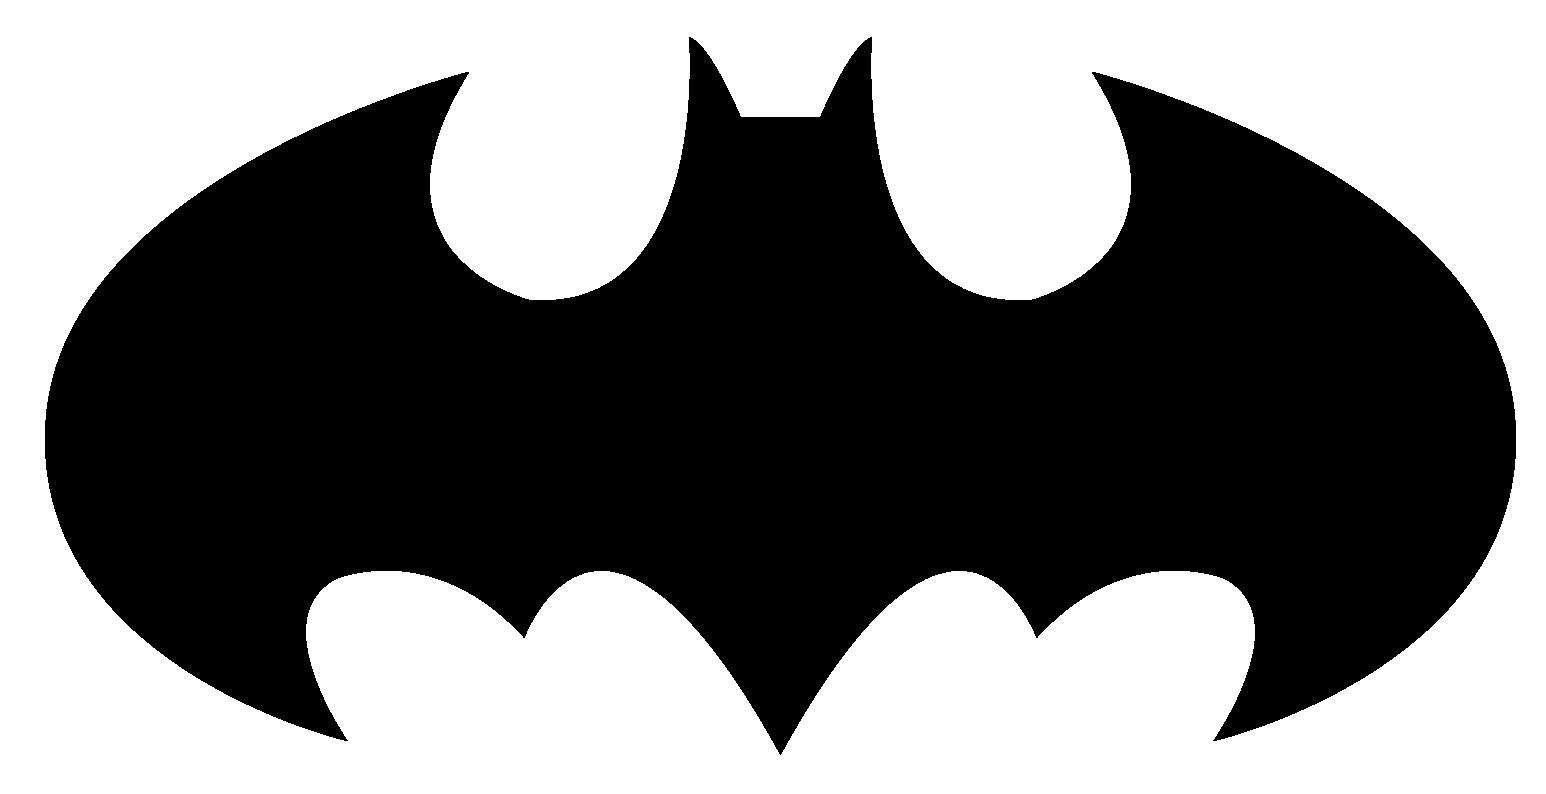 Pumpkin face clipart black and white clip art black and white ➡➡ Bat Black And White Clip Art Images Free Download clip art black and white